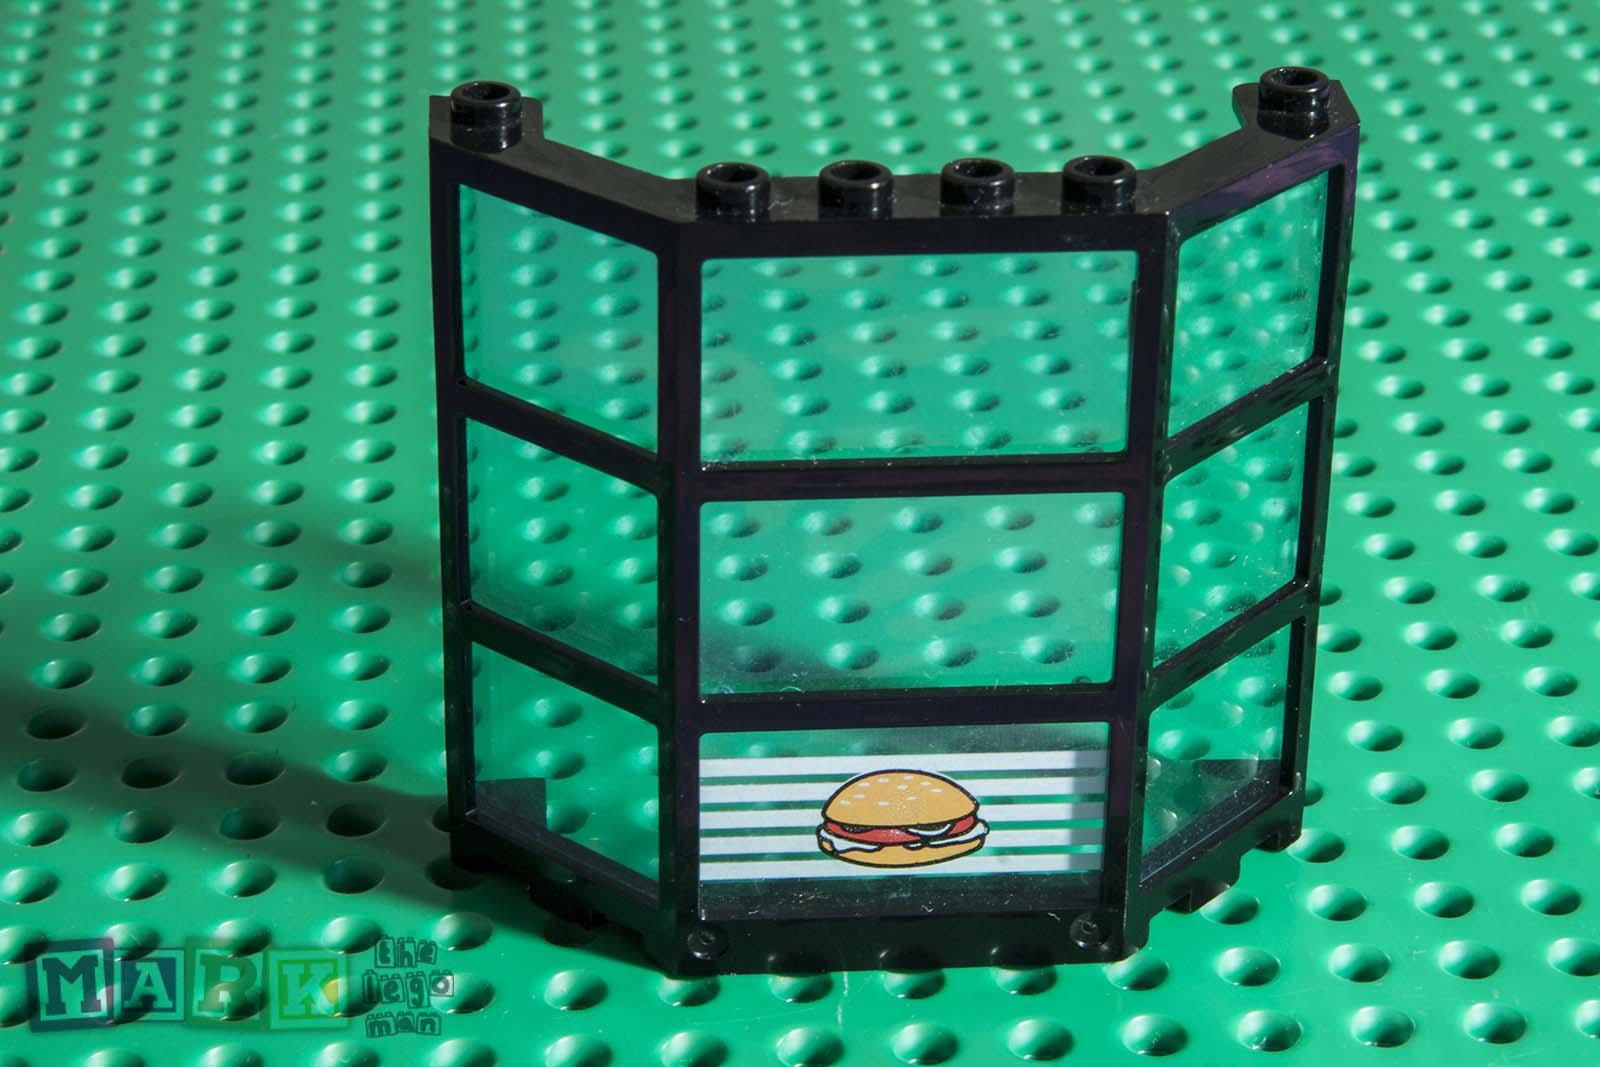 Lego 30185c03px1 Window Bay 3x8x6 TrLtBlue Glass White Lines w Hamburger  Pattern